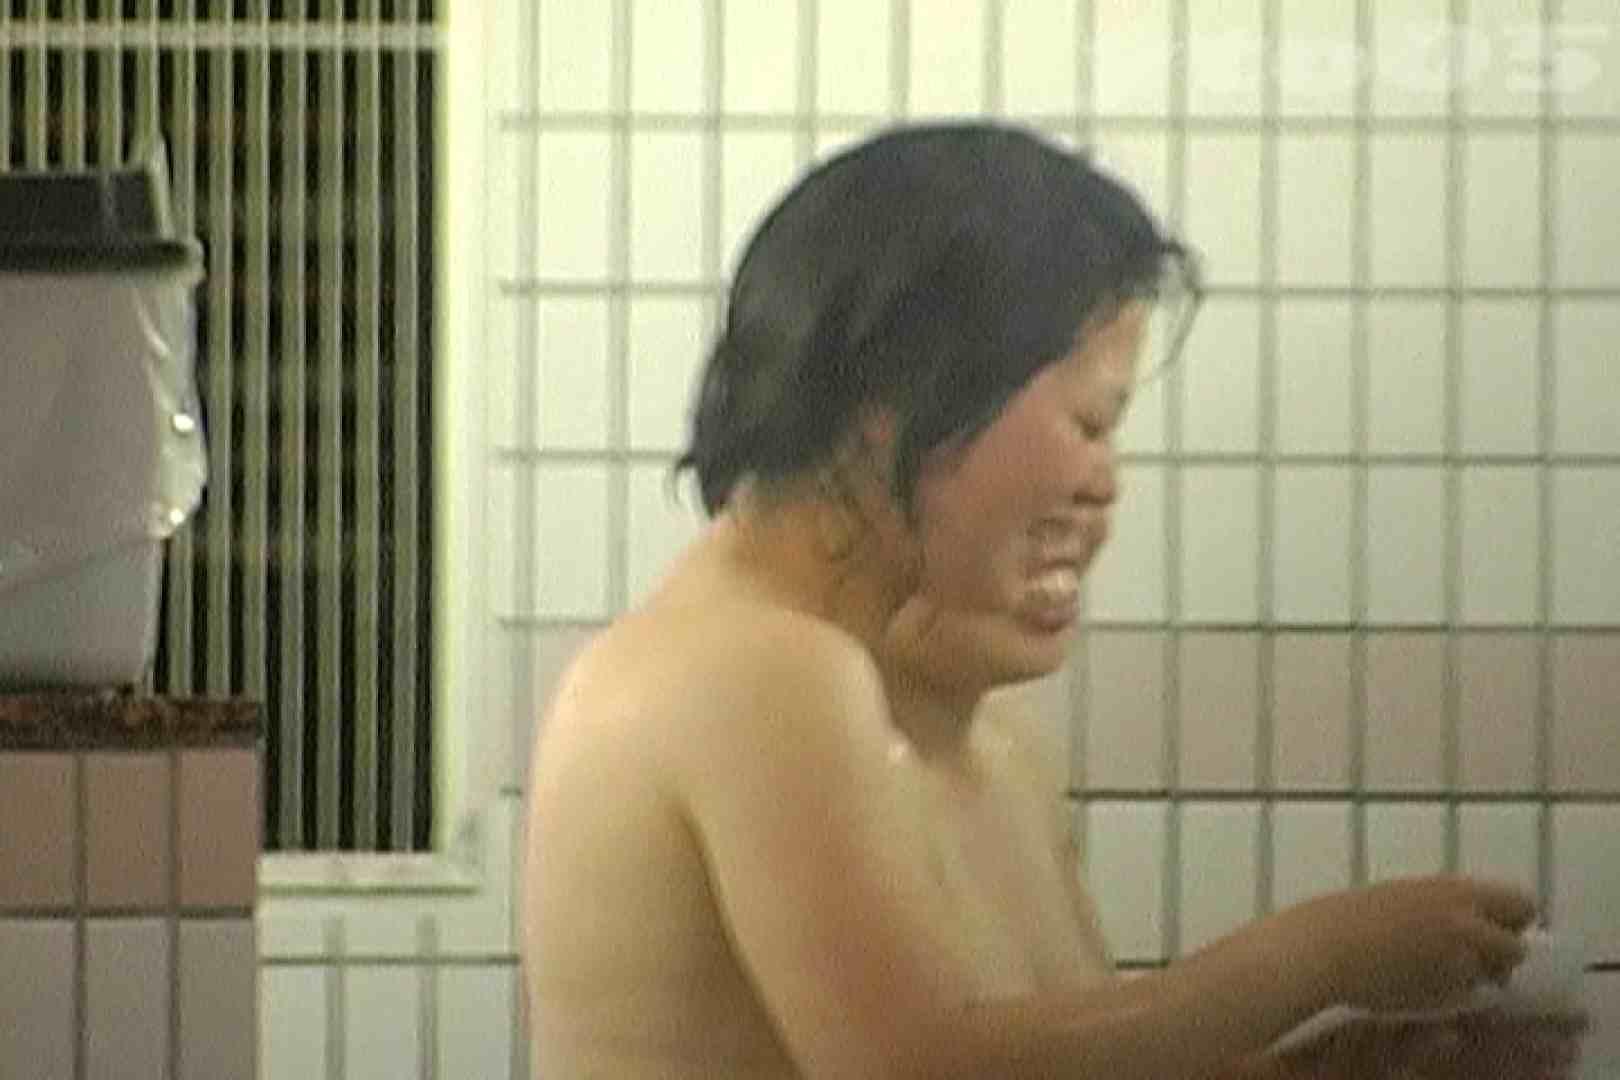 ▲復活限定▲合宿ホテル女風呂盗撮 Vol.28 盗撮編 オメコ無修正動画無料 93枚 60